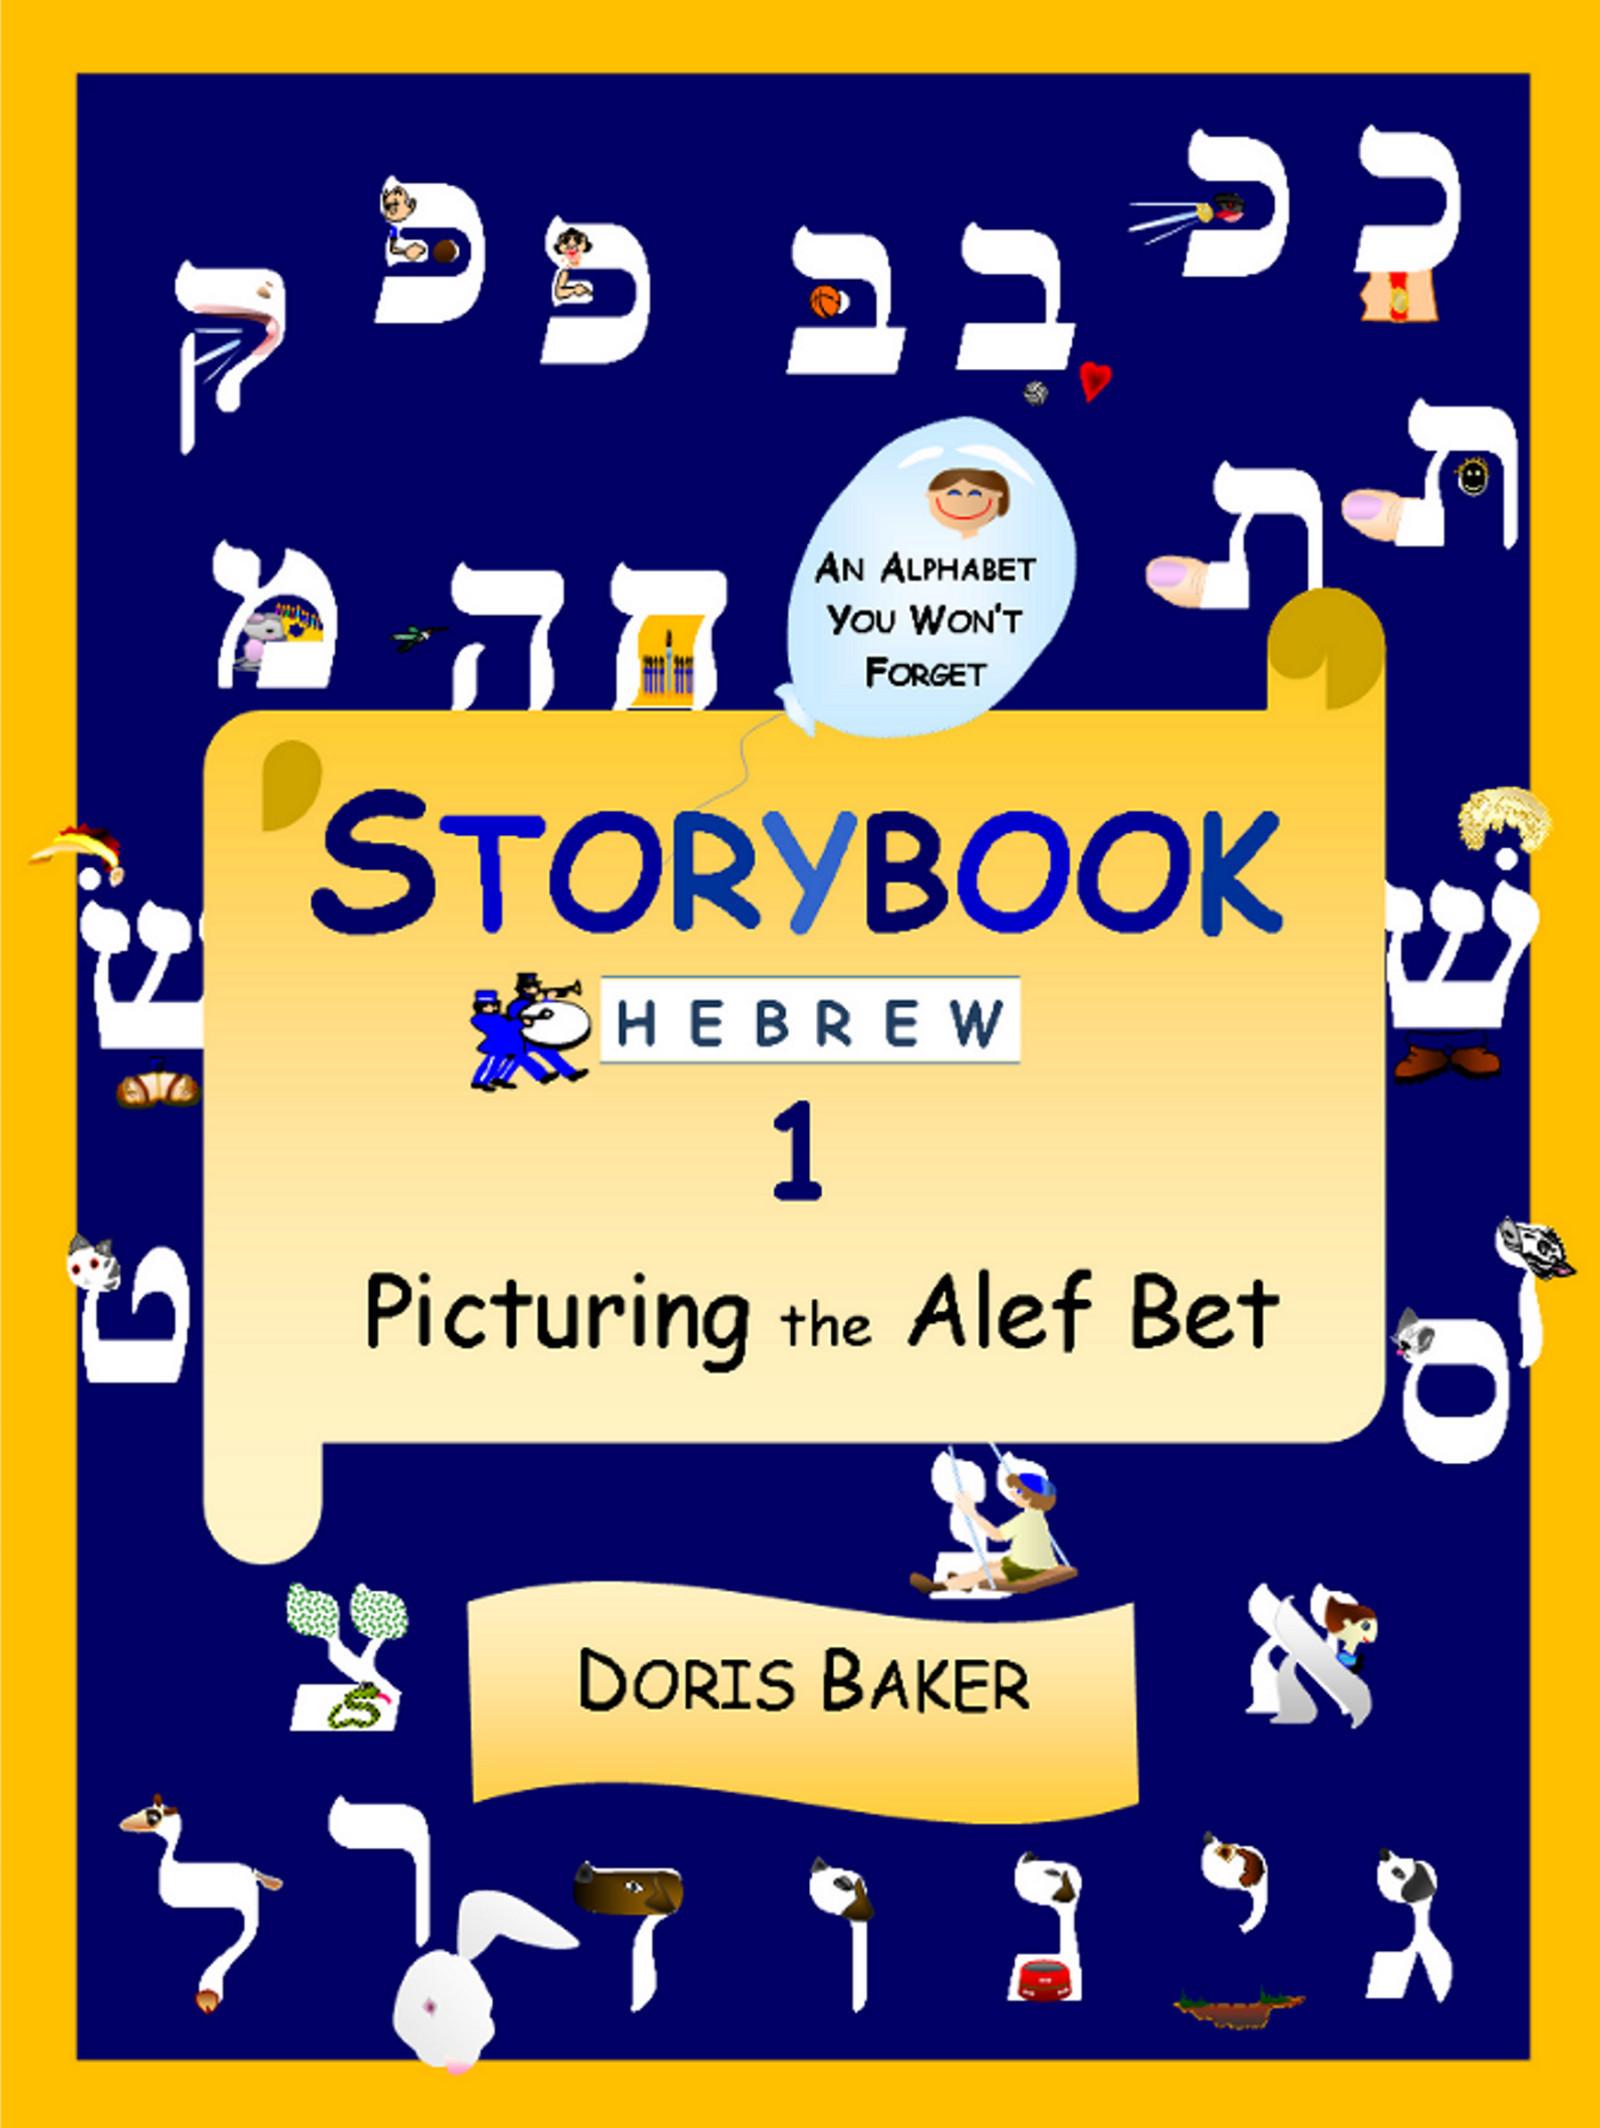 Storybook Hebrew 1: Picturing the Alef Bet Doris Baker